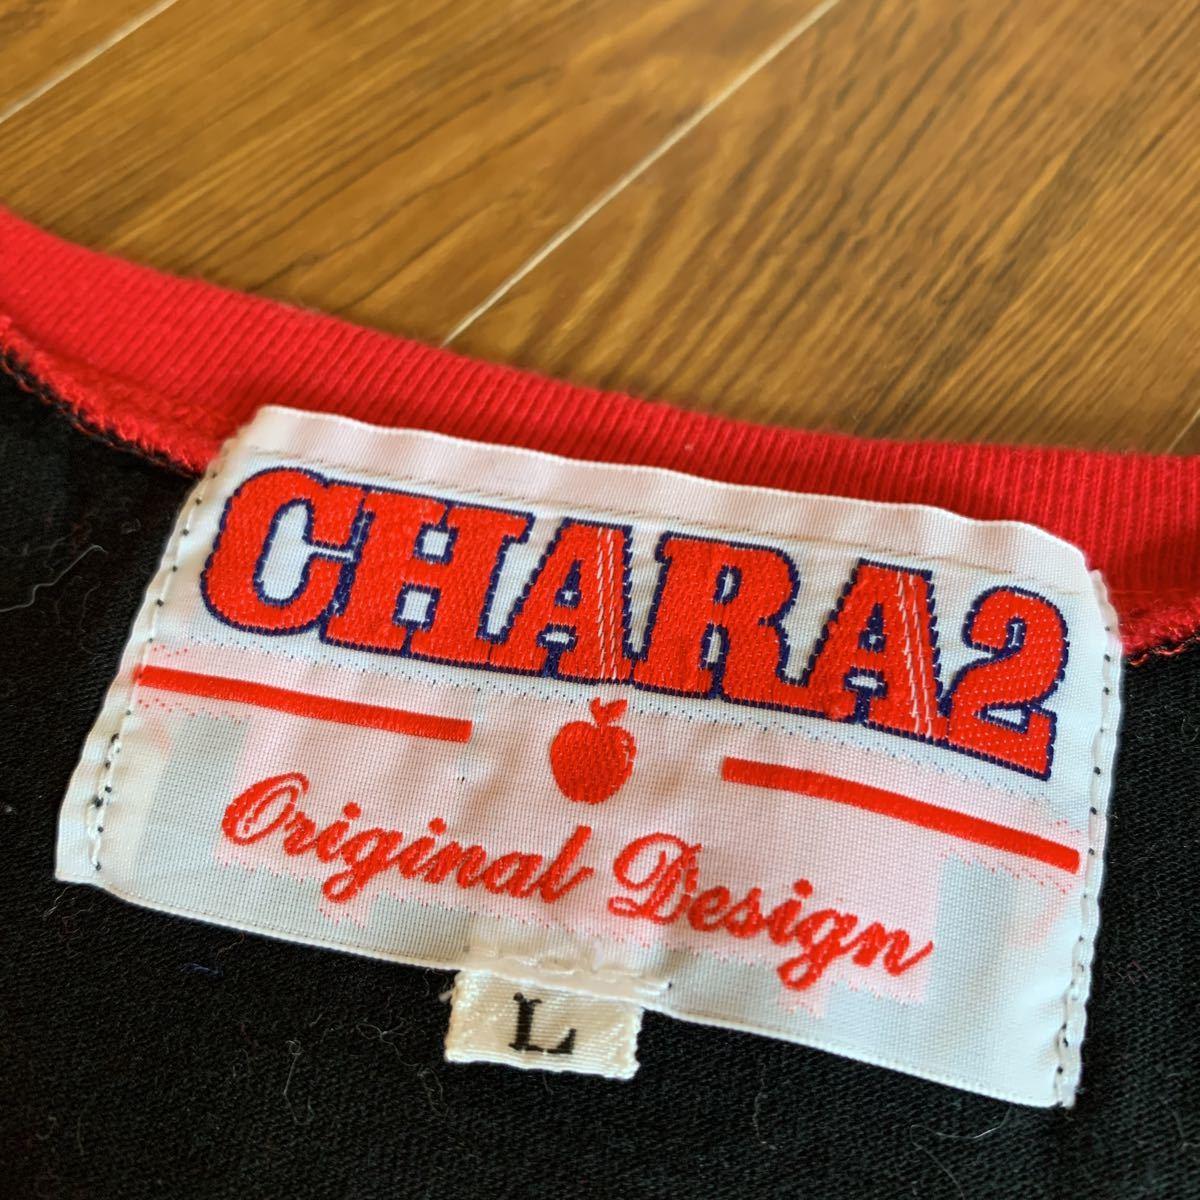 CHARA2 ロゴTシャツ 半袖Tシャツ Lサイズ 送料込